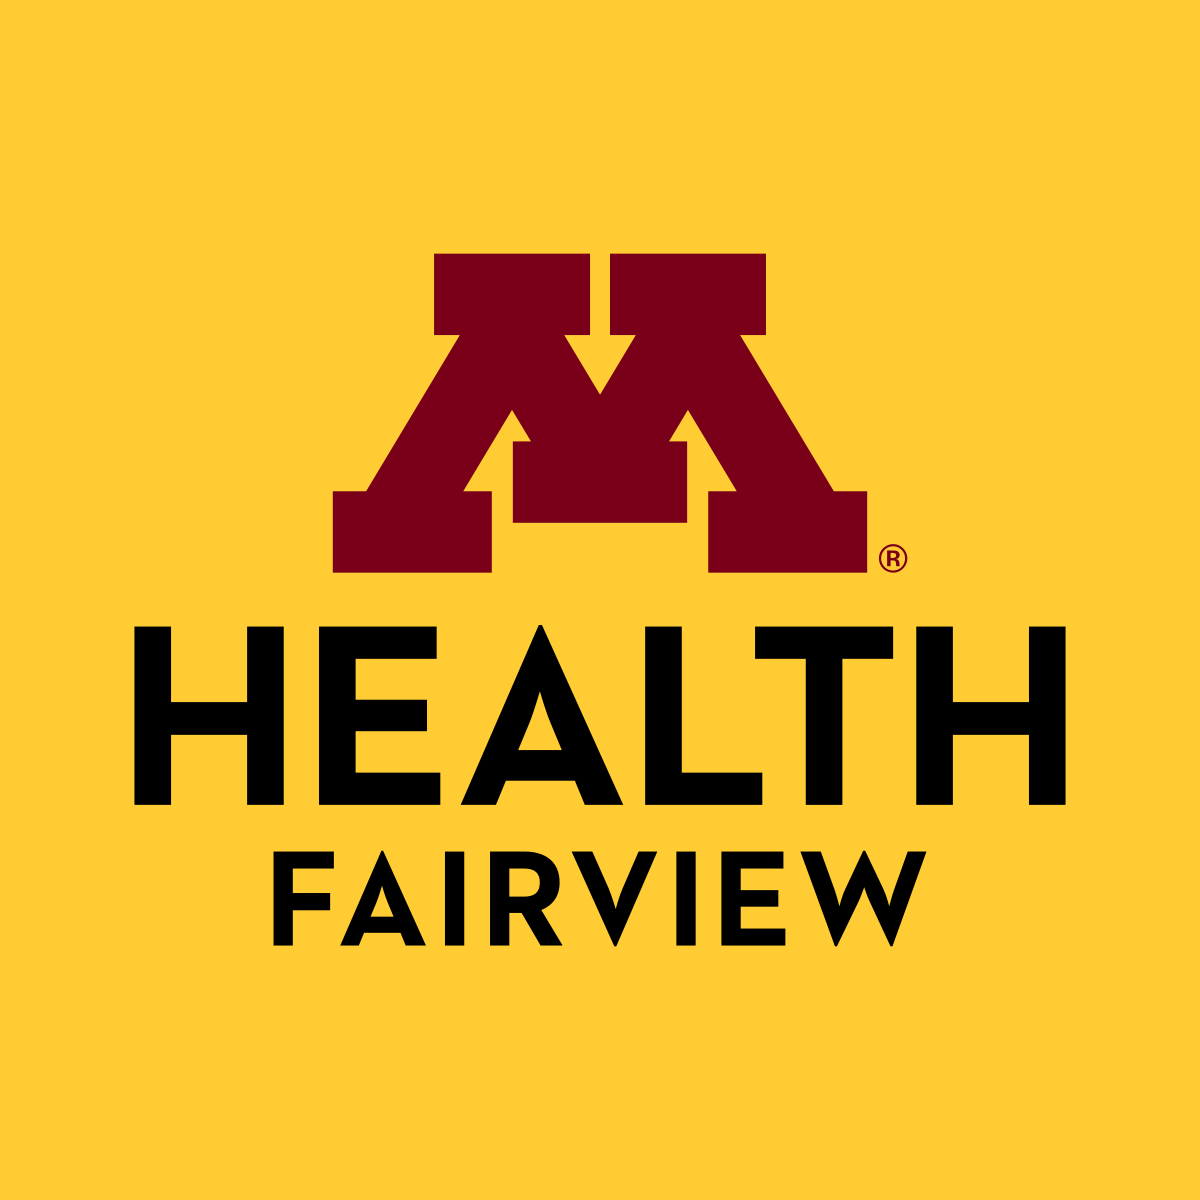 Fairview-Health-Services-Logo